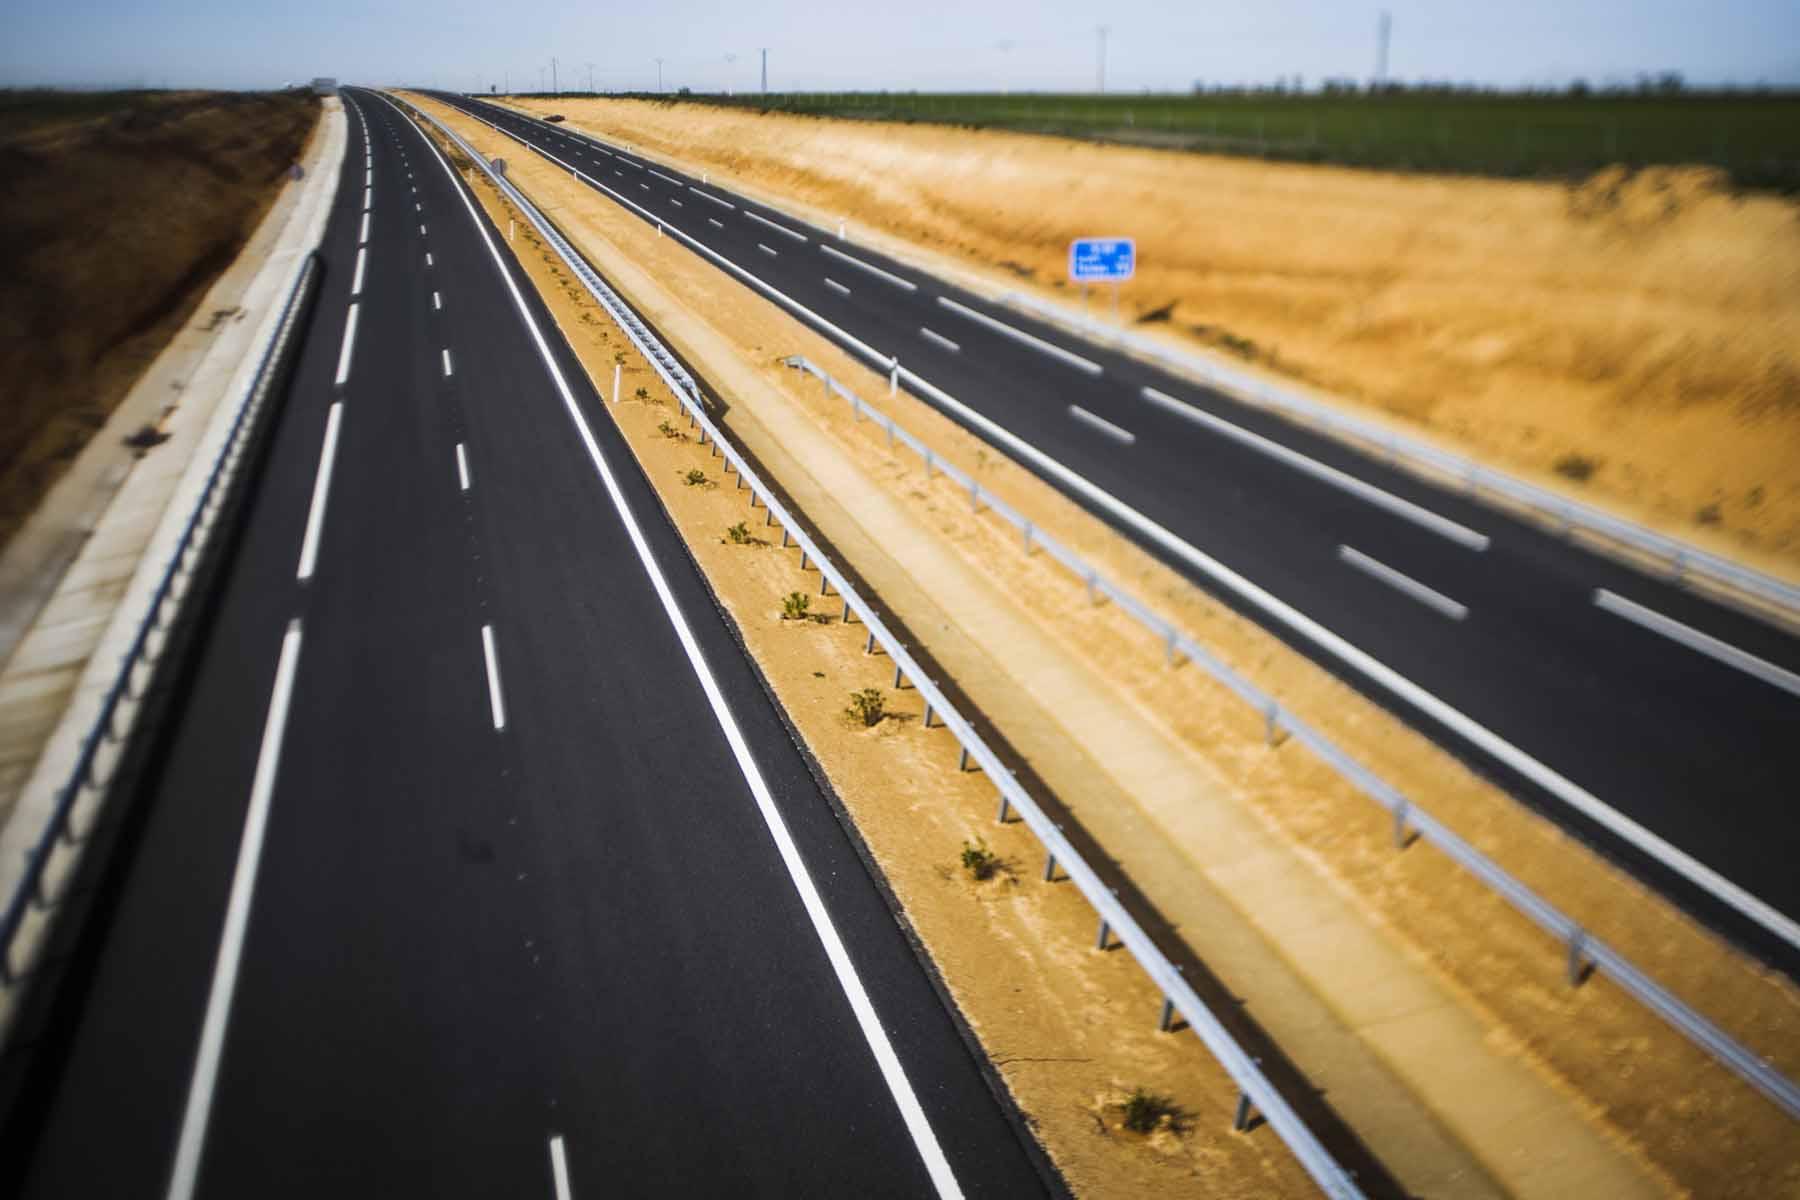 Highway A-40 Ocaña-Cuenca.